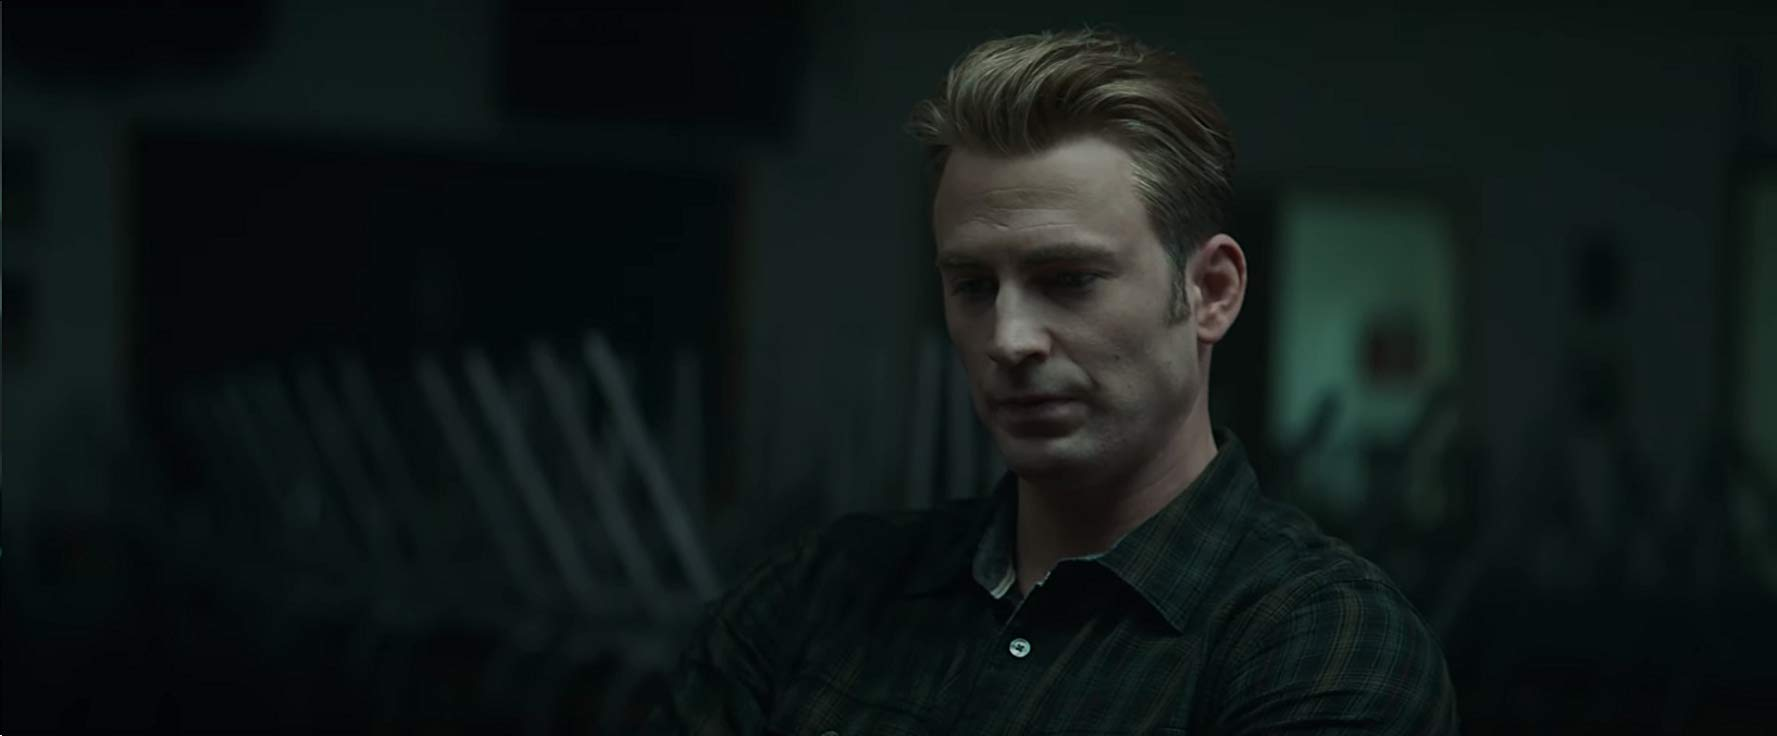 Avengers: Endgame, una scena con Chris Evans